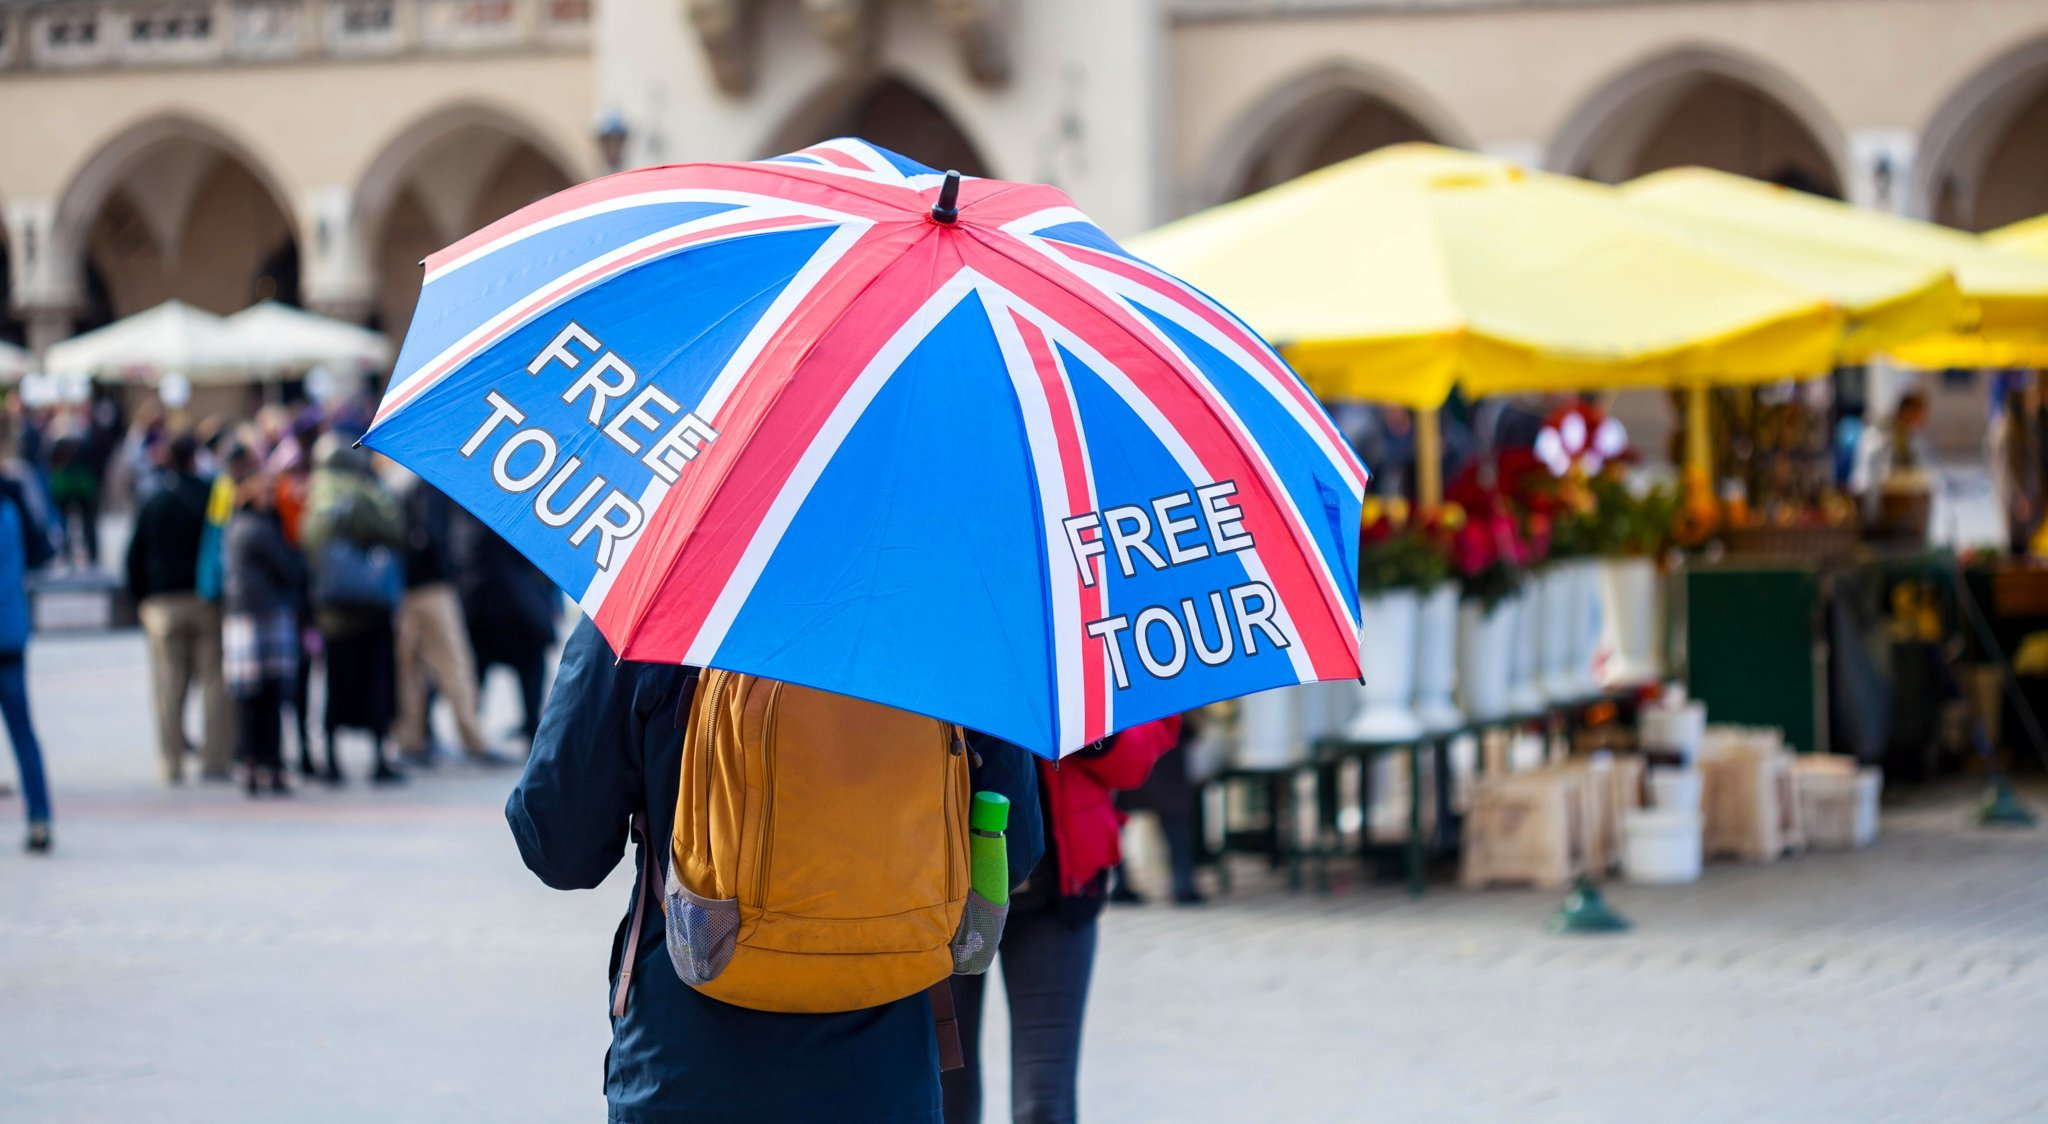 The Best-Kept Secrets For Finding The Cheapest Travel Deals